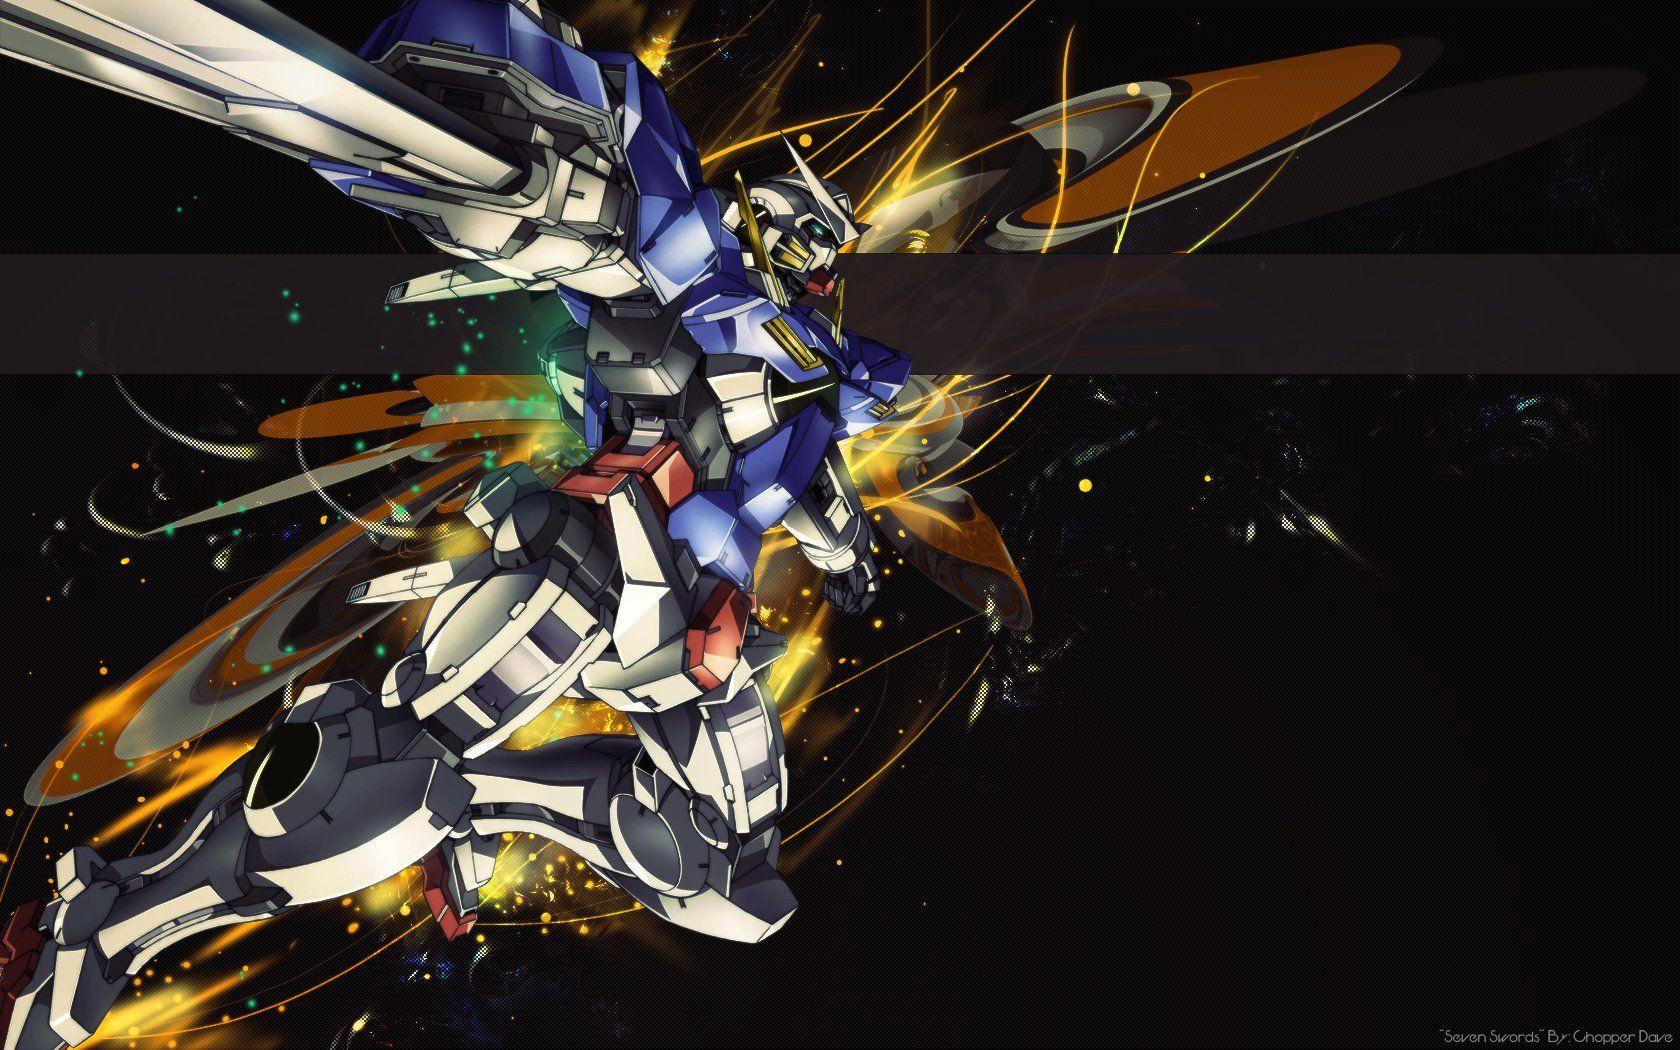 Gundam Barbatos Wallpaper High Definition Android Wallpaper Anime Hd Anime Wallpapers Gundam Wallpapers